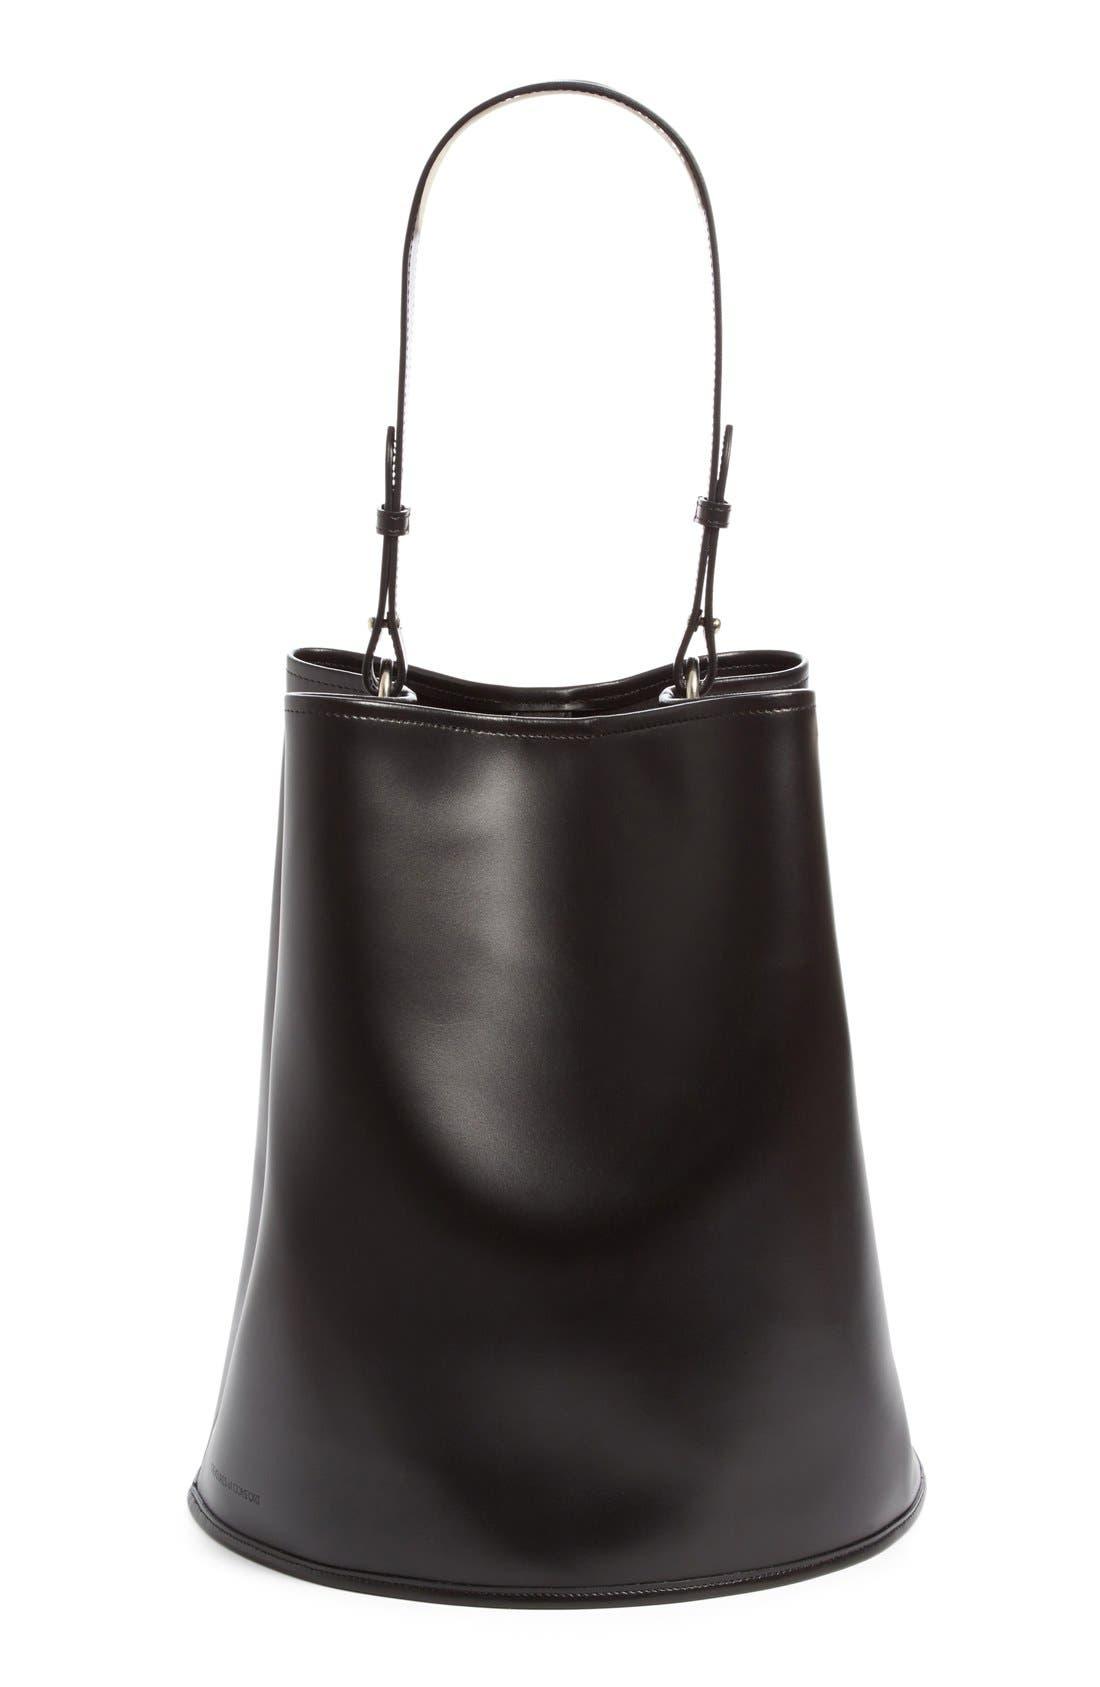 Alternate Image 1 Selected - Creatures of Comfort Large Calfskin Leather Bucket Bag